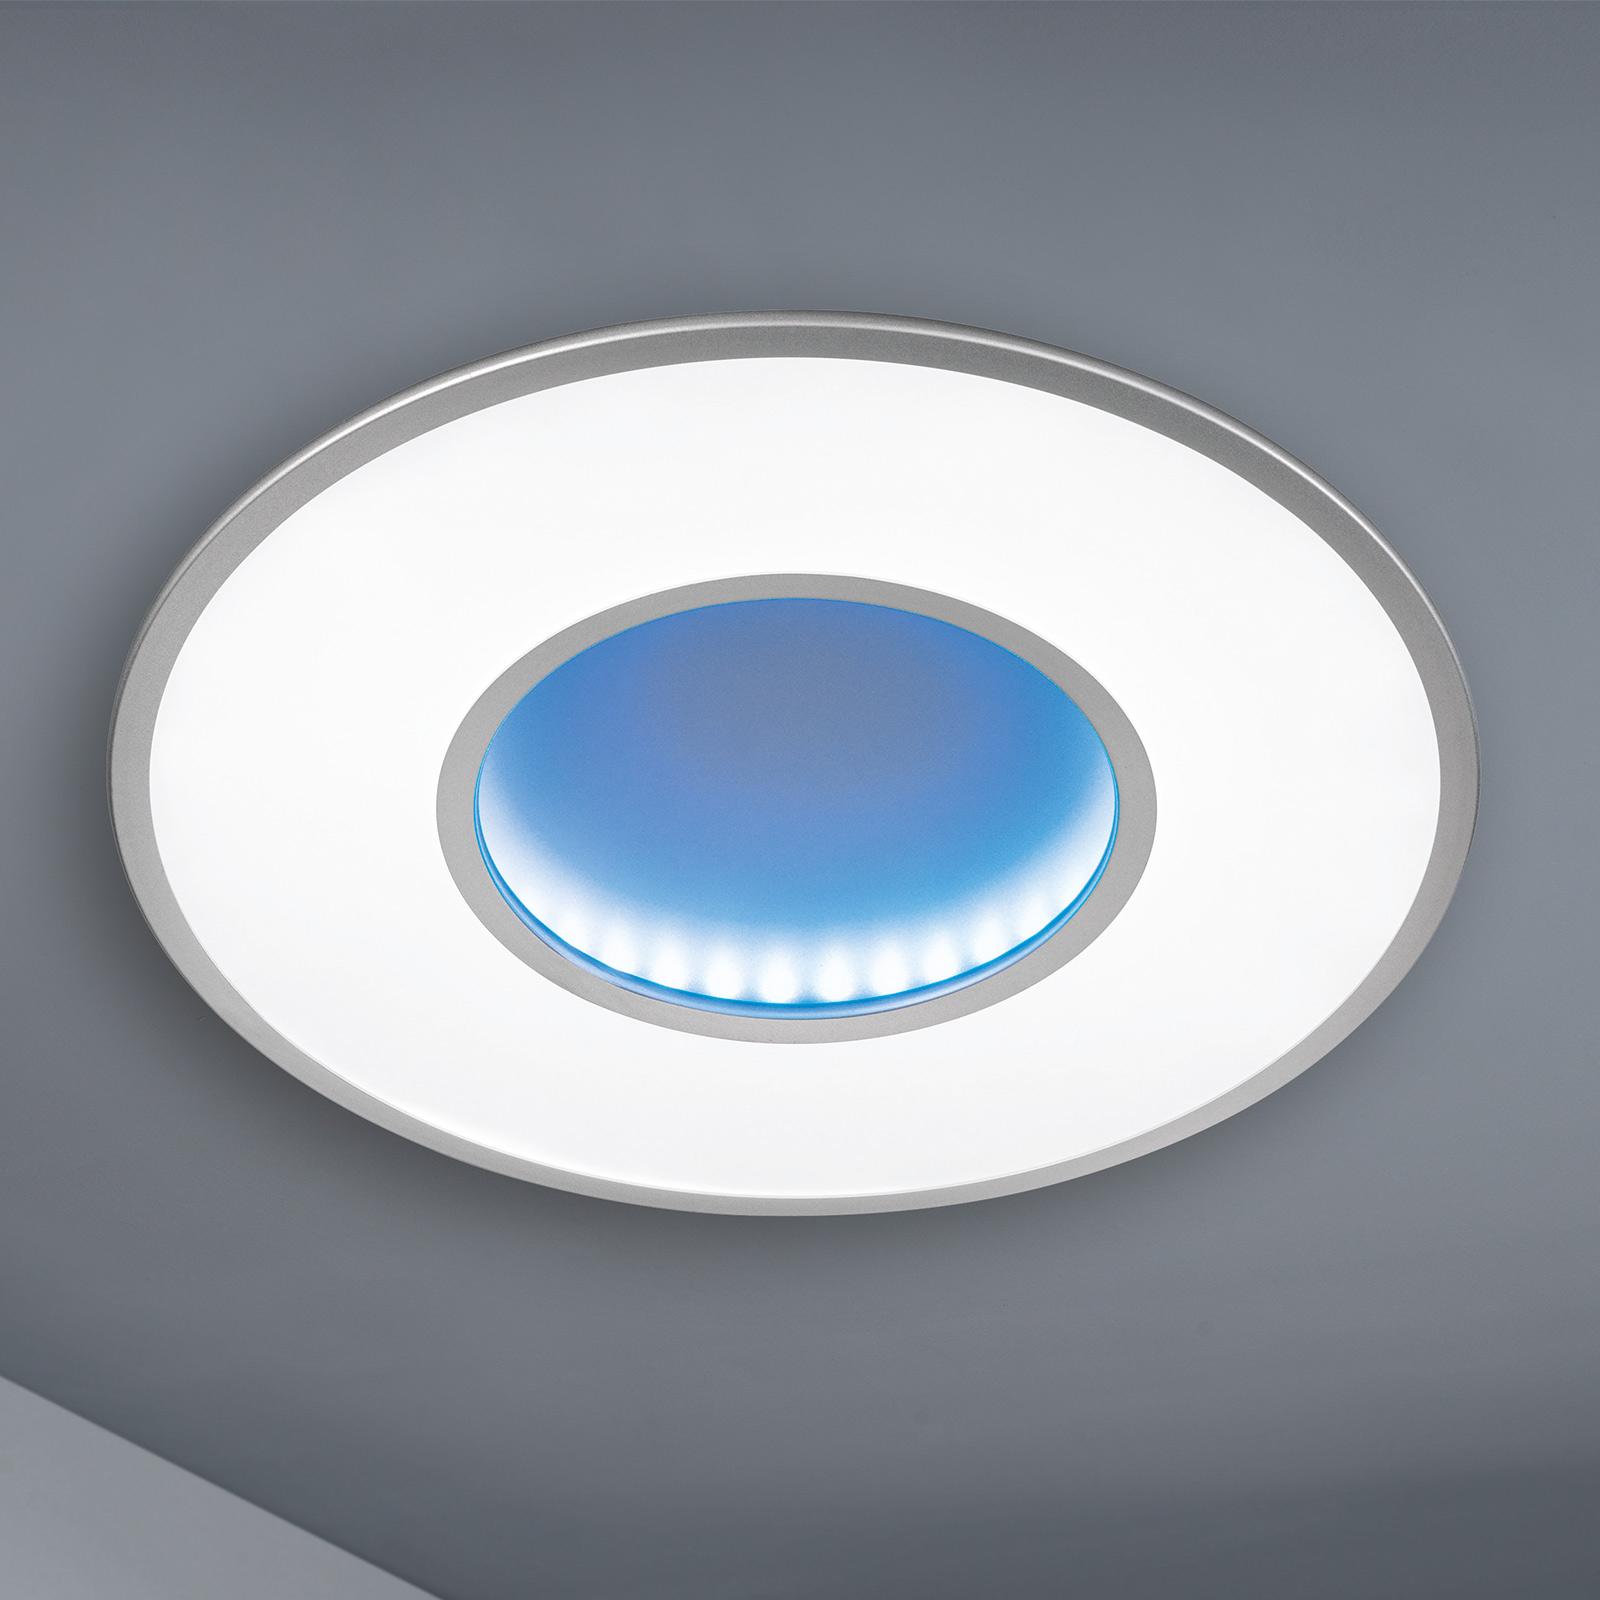 LED-taklampe Jona med fjernkontroll